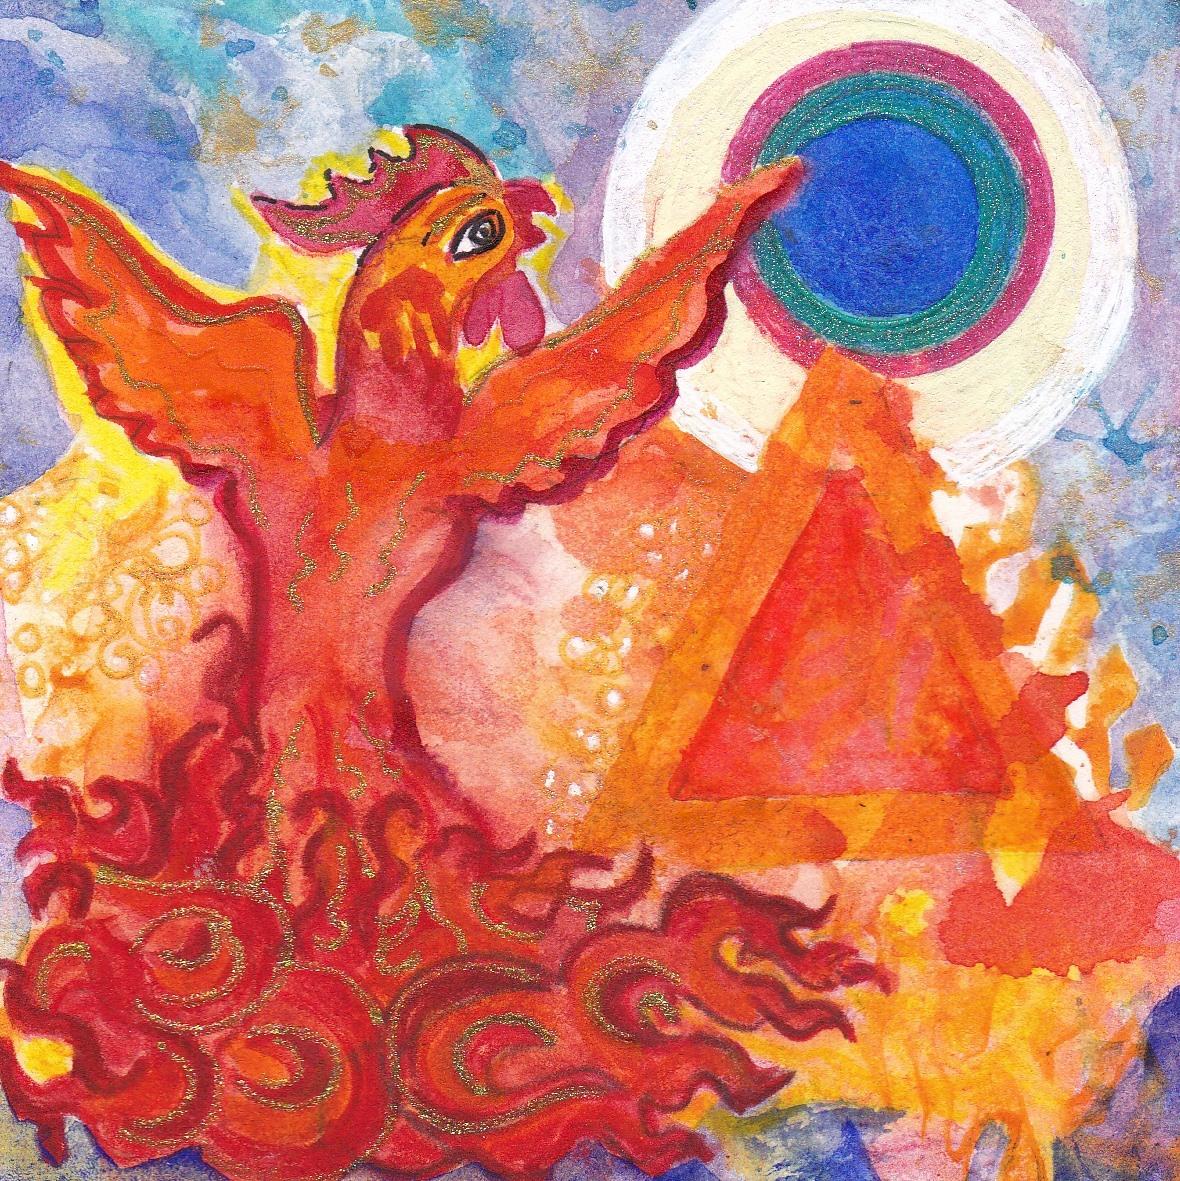 Firebird by Ingmar Pema Dechen